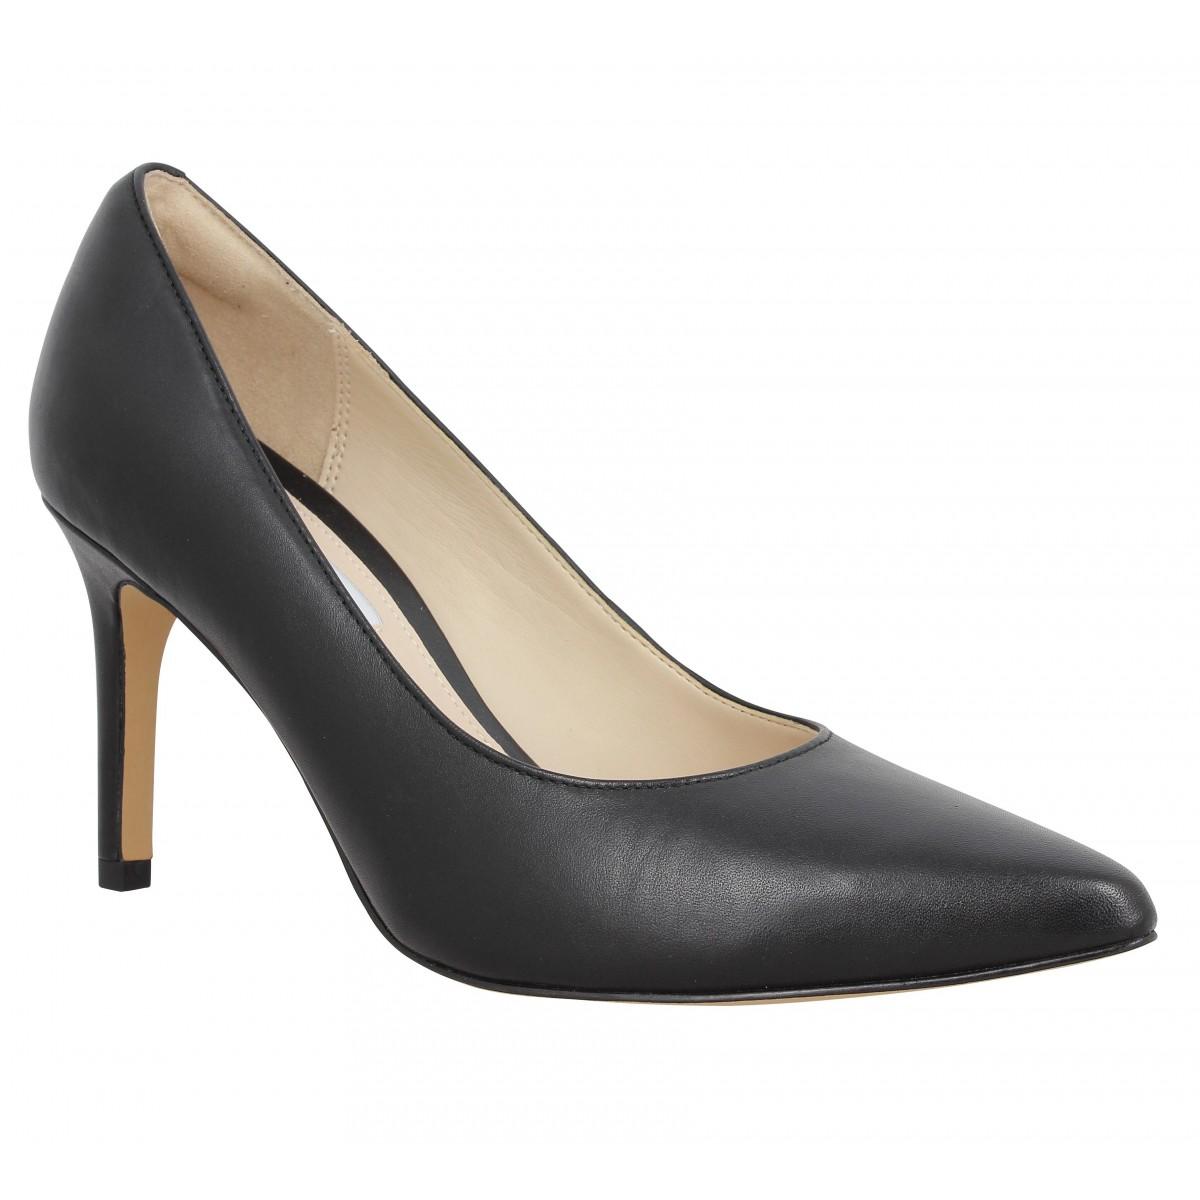 Clarks Femme Dinah Keer Cuir-37-noir